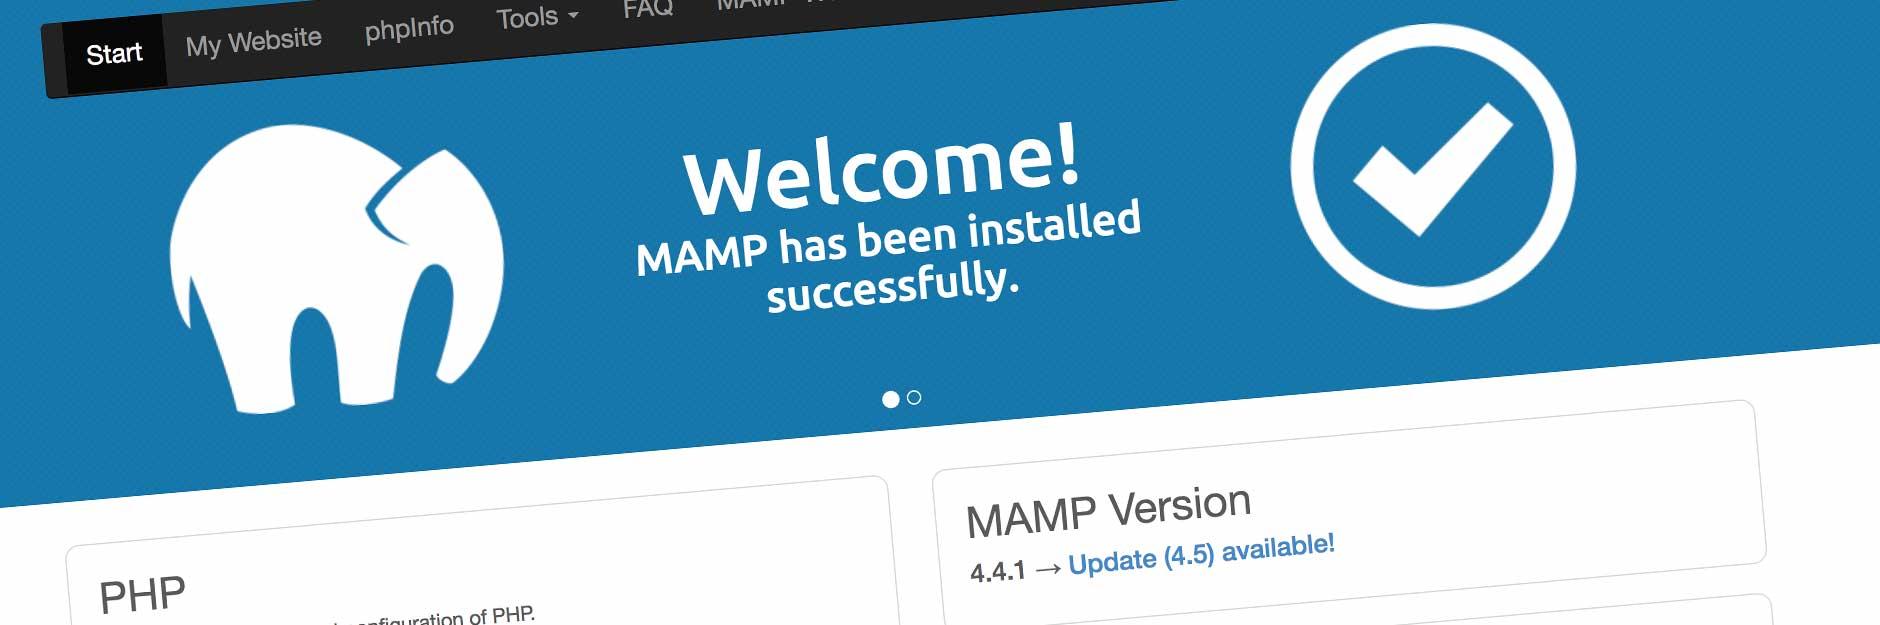 【WordPress】MAMPでローカル環境にWordPressをインストールしたい